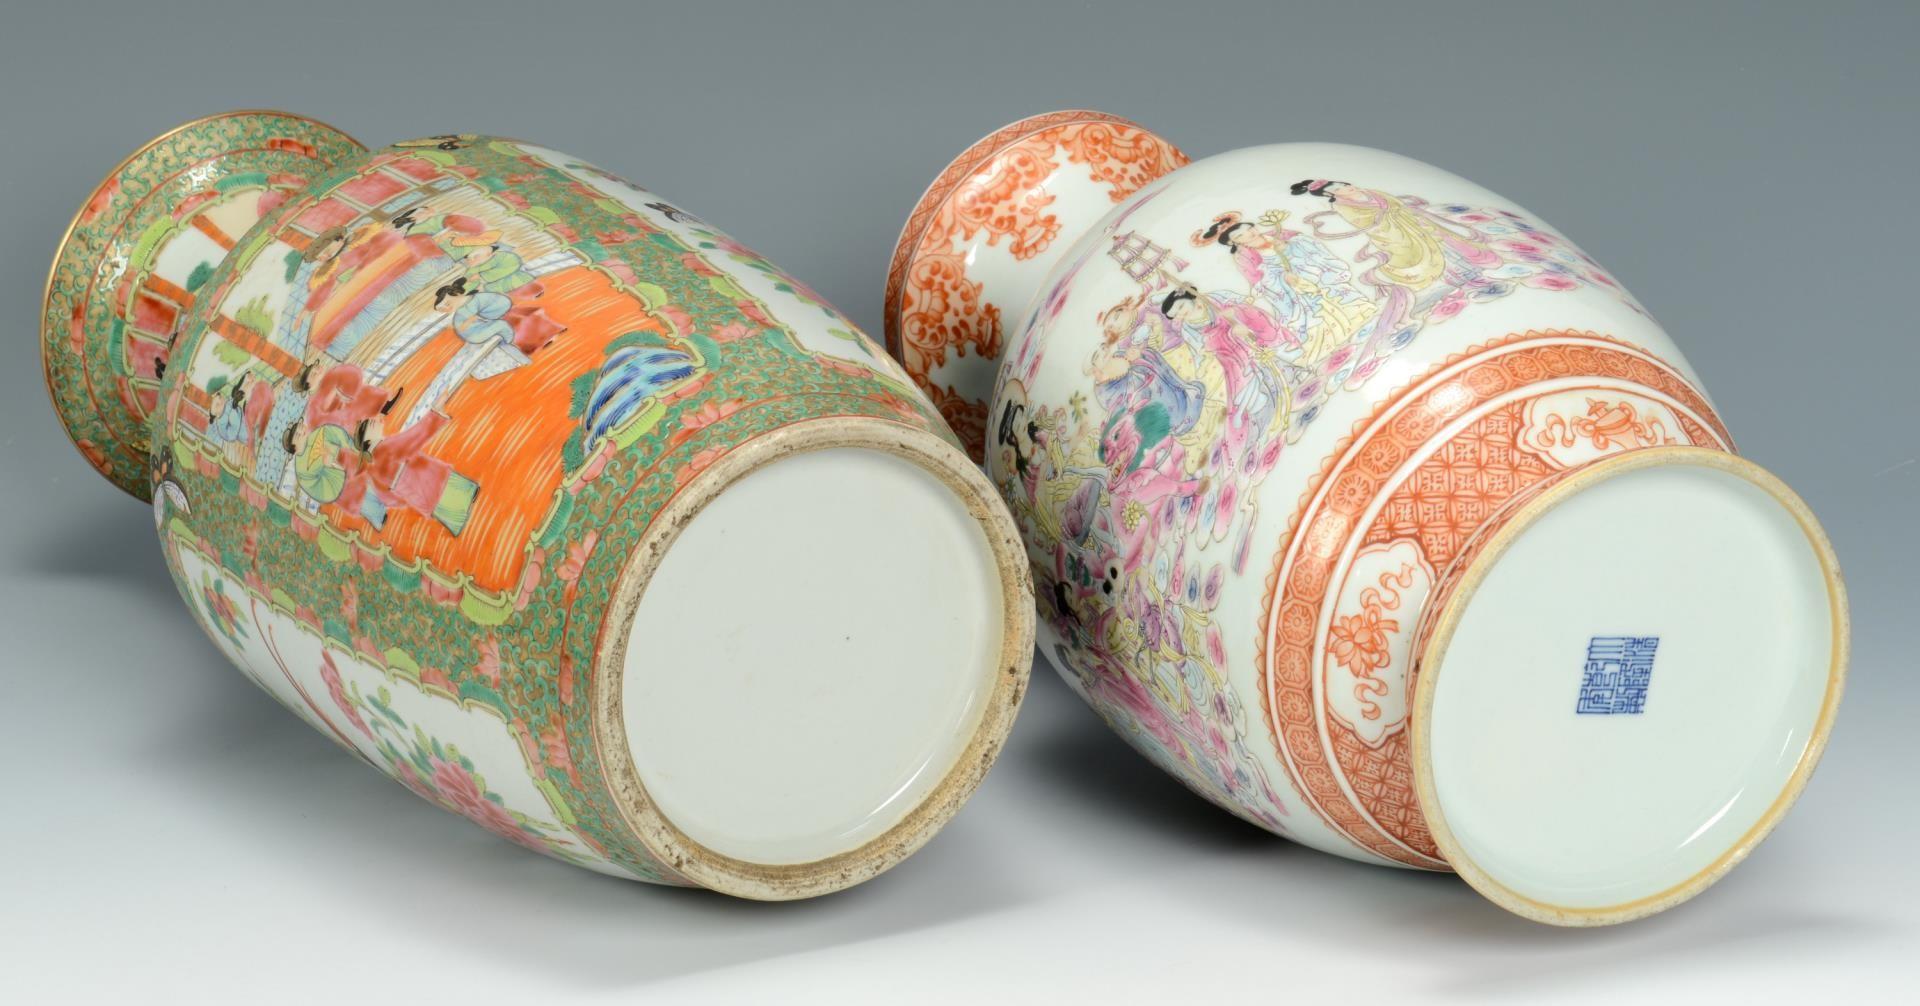 Lot 3594236: 2 Chinese Famille Rose Porcelain Vases